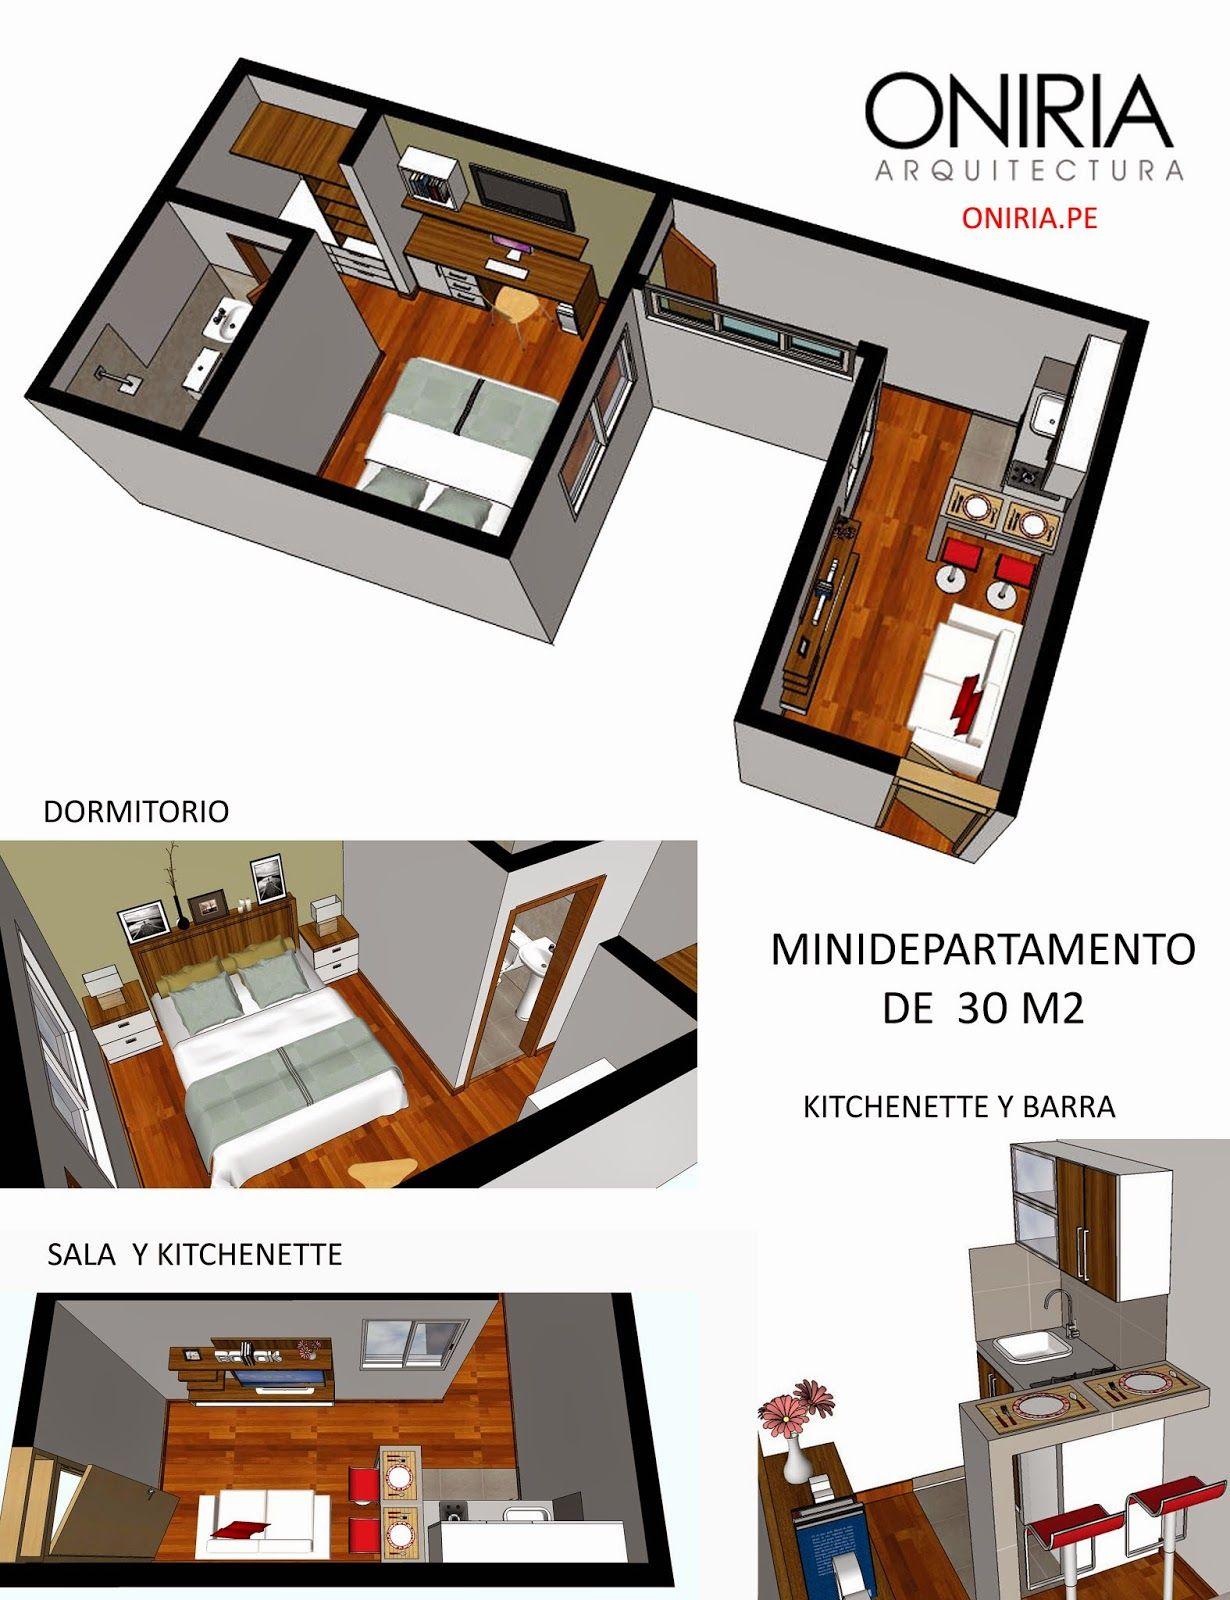 Oniria dise o de minidepartamento de 30 m2 oniria for Diseno minidepartamento